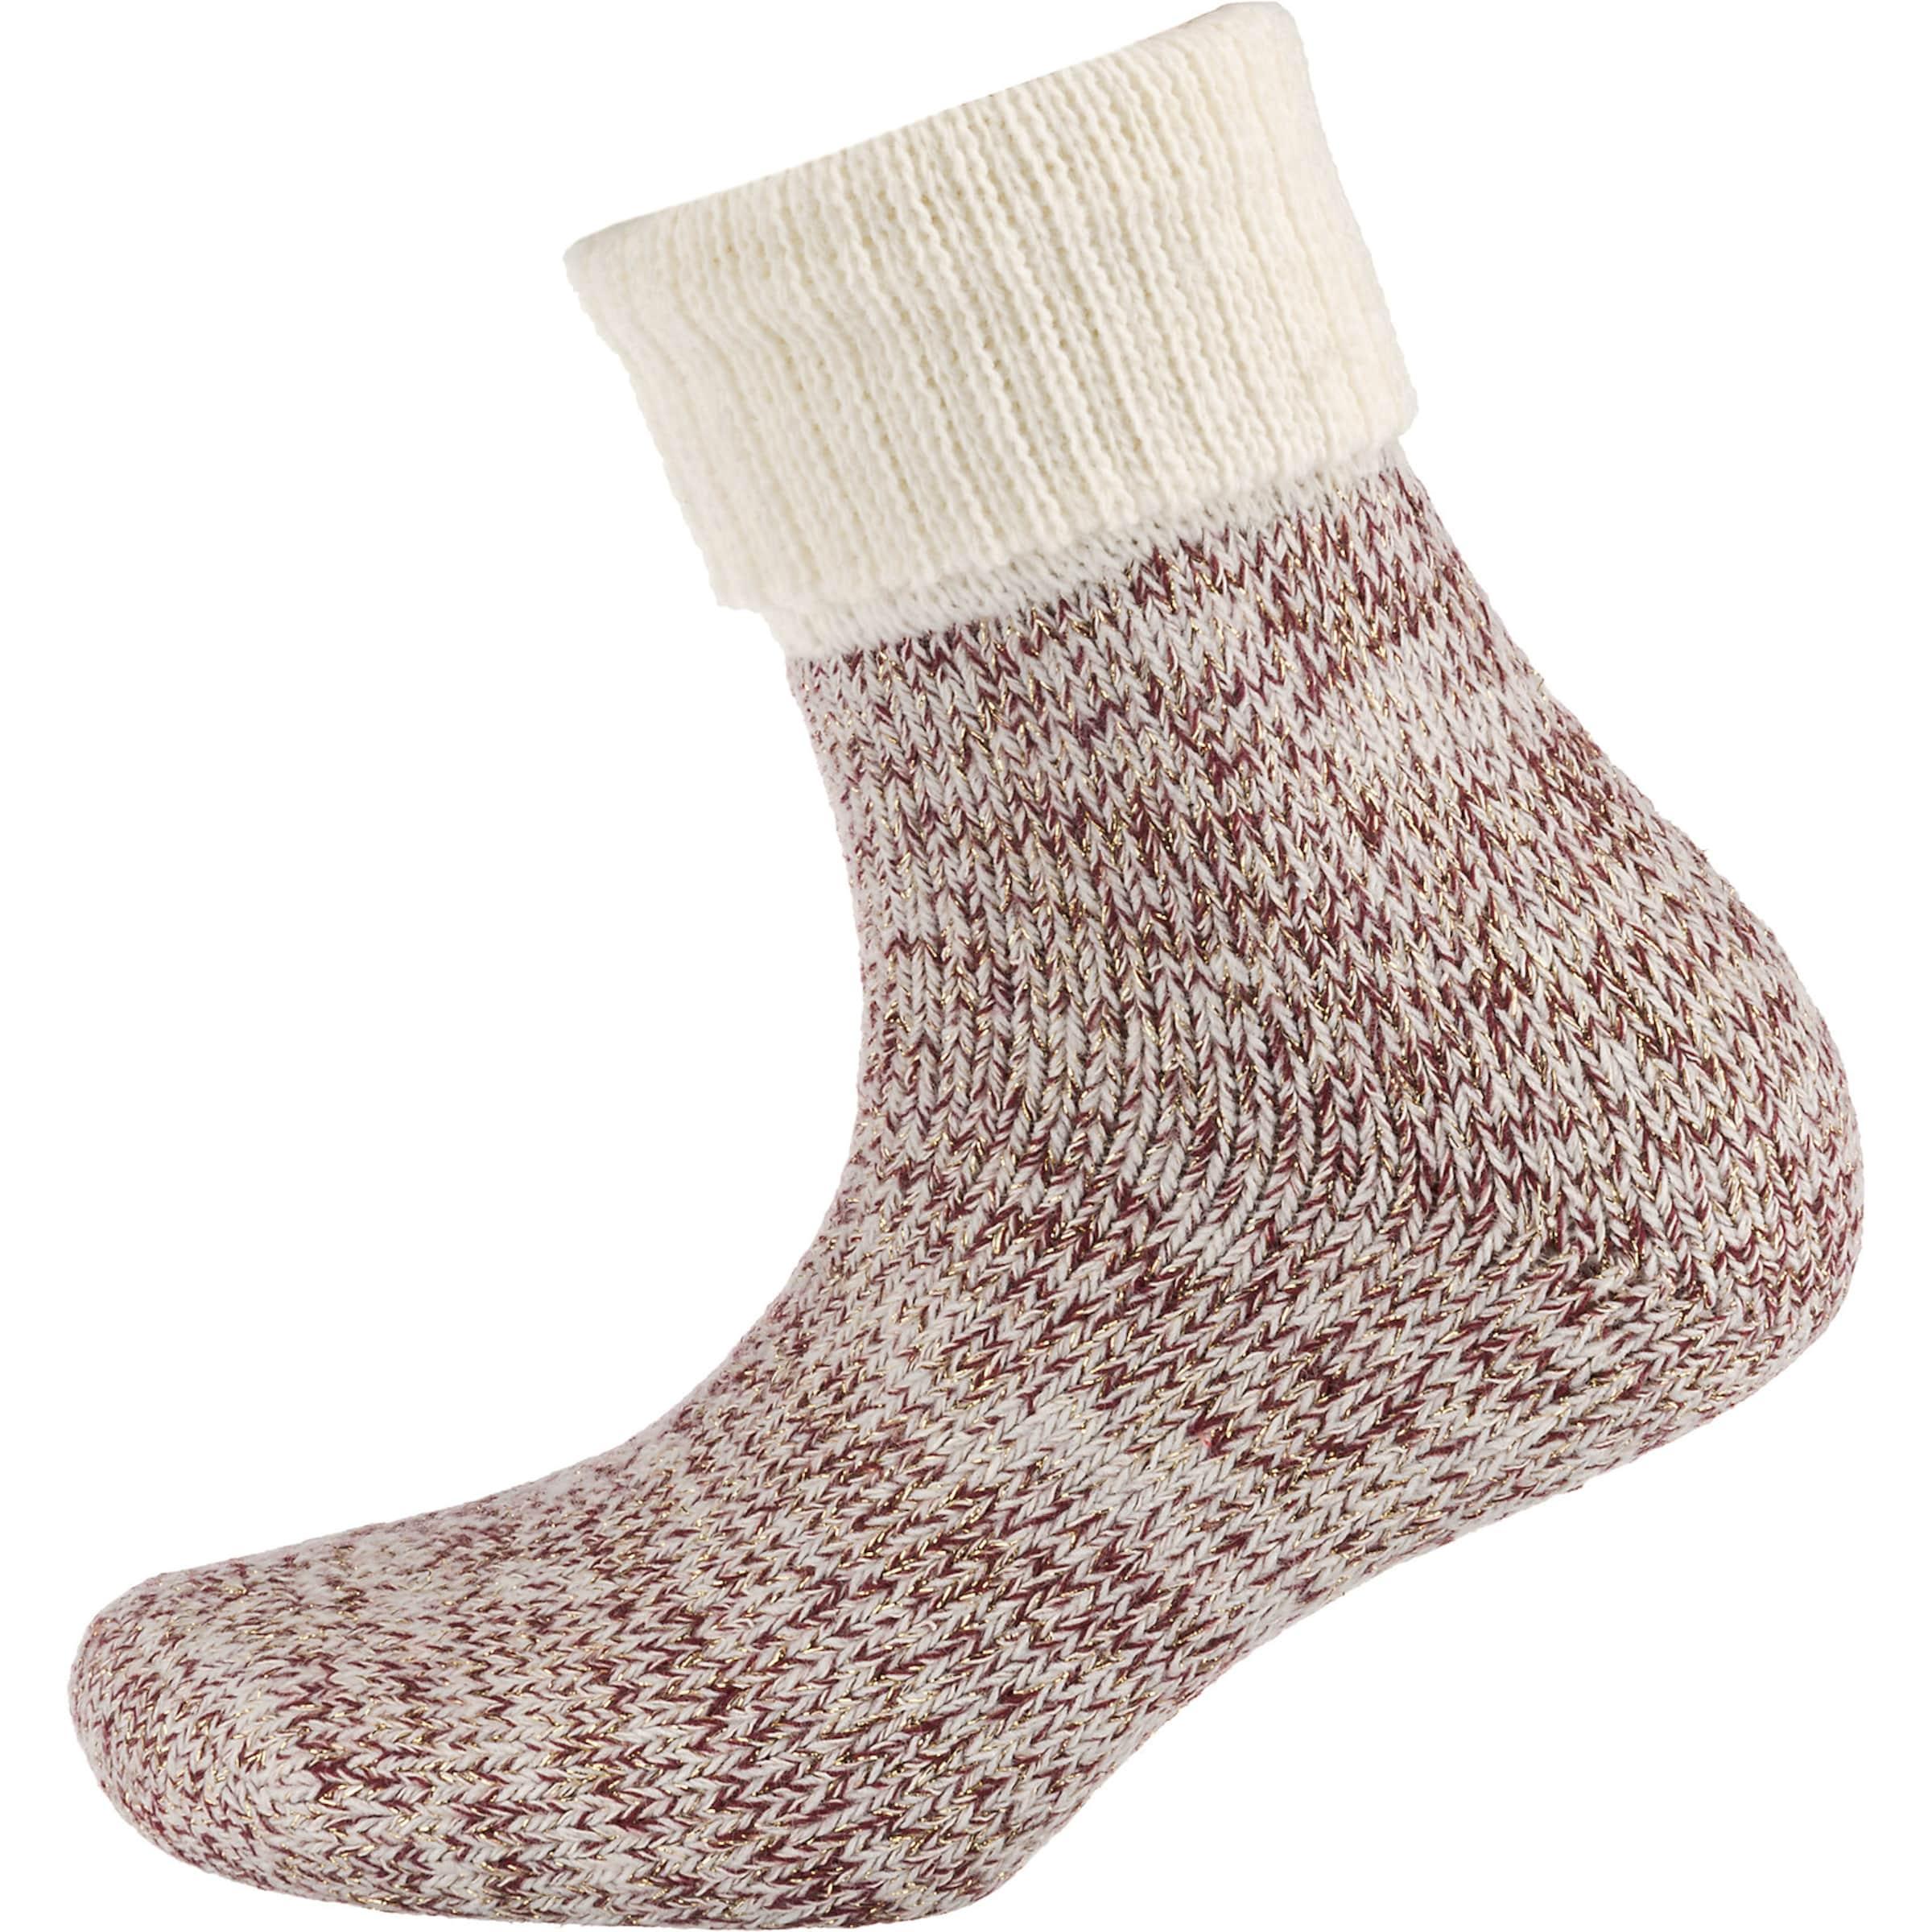 Tom RotWeiß Tailor Socken In Tom Tailor doCeBx